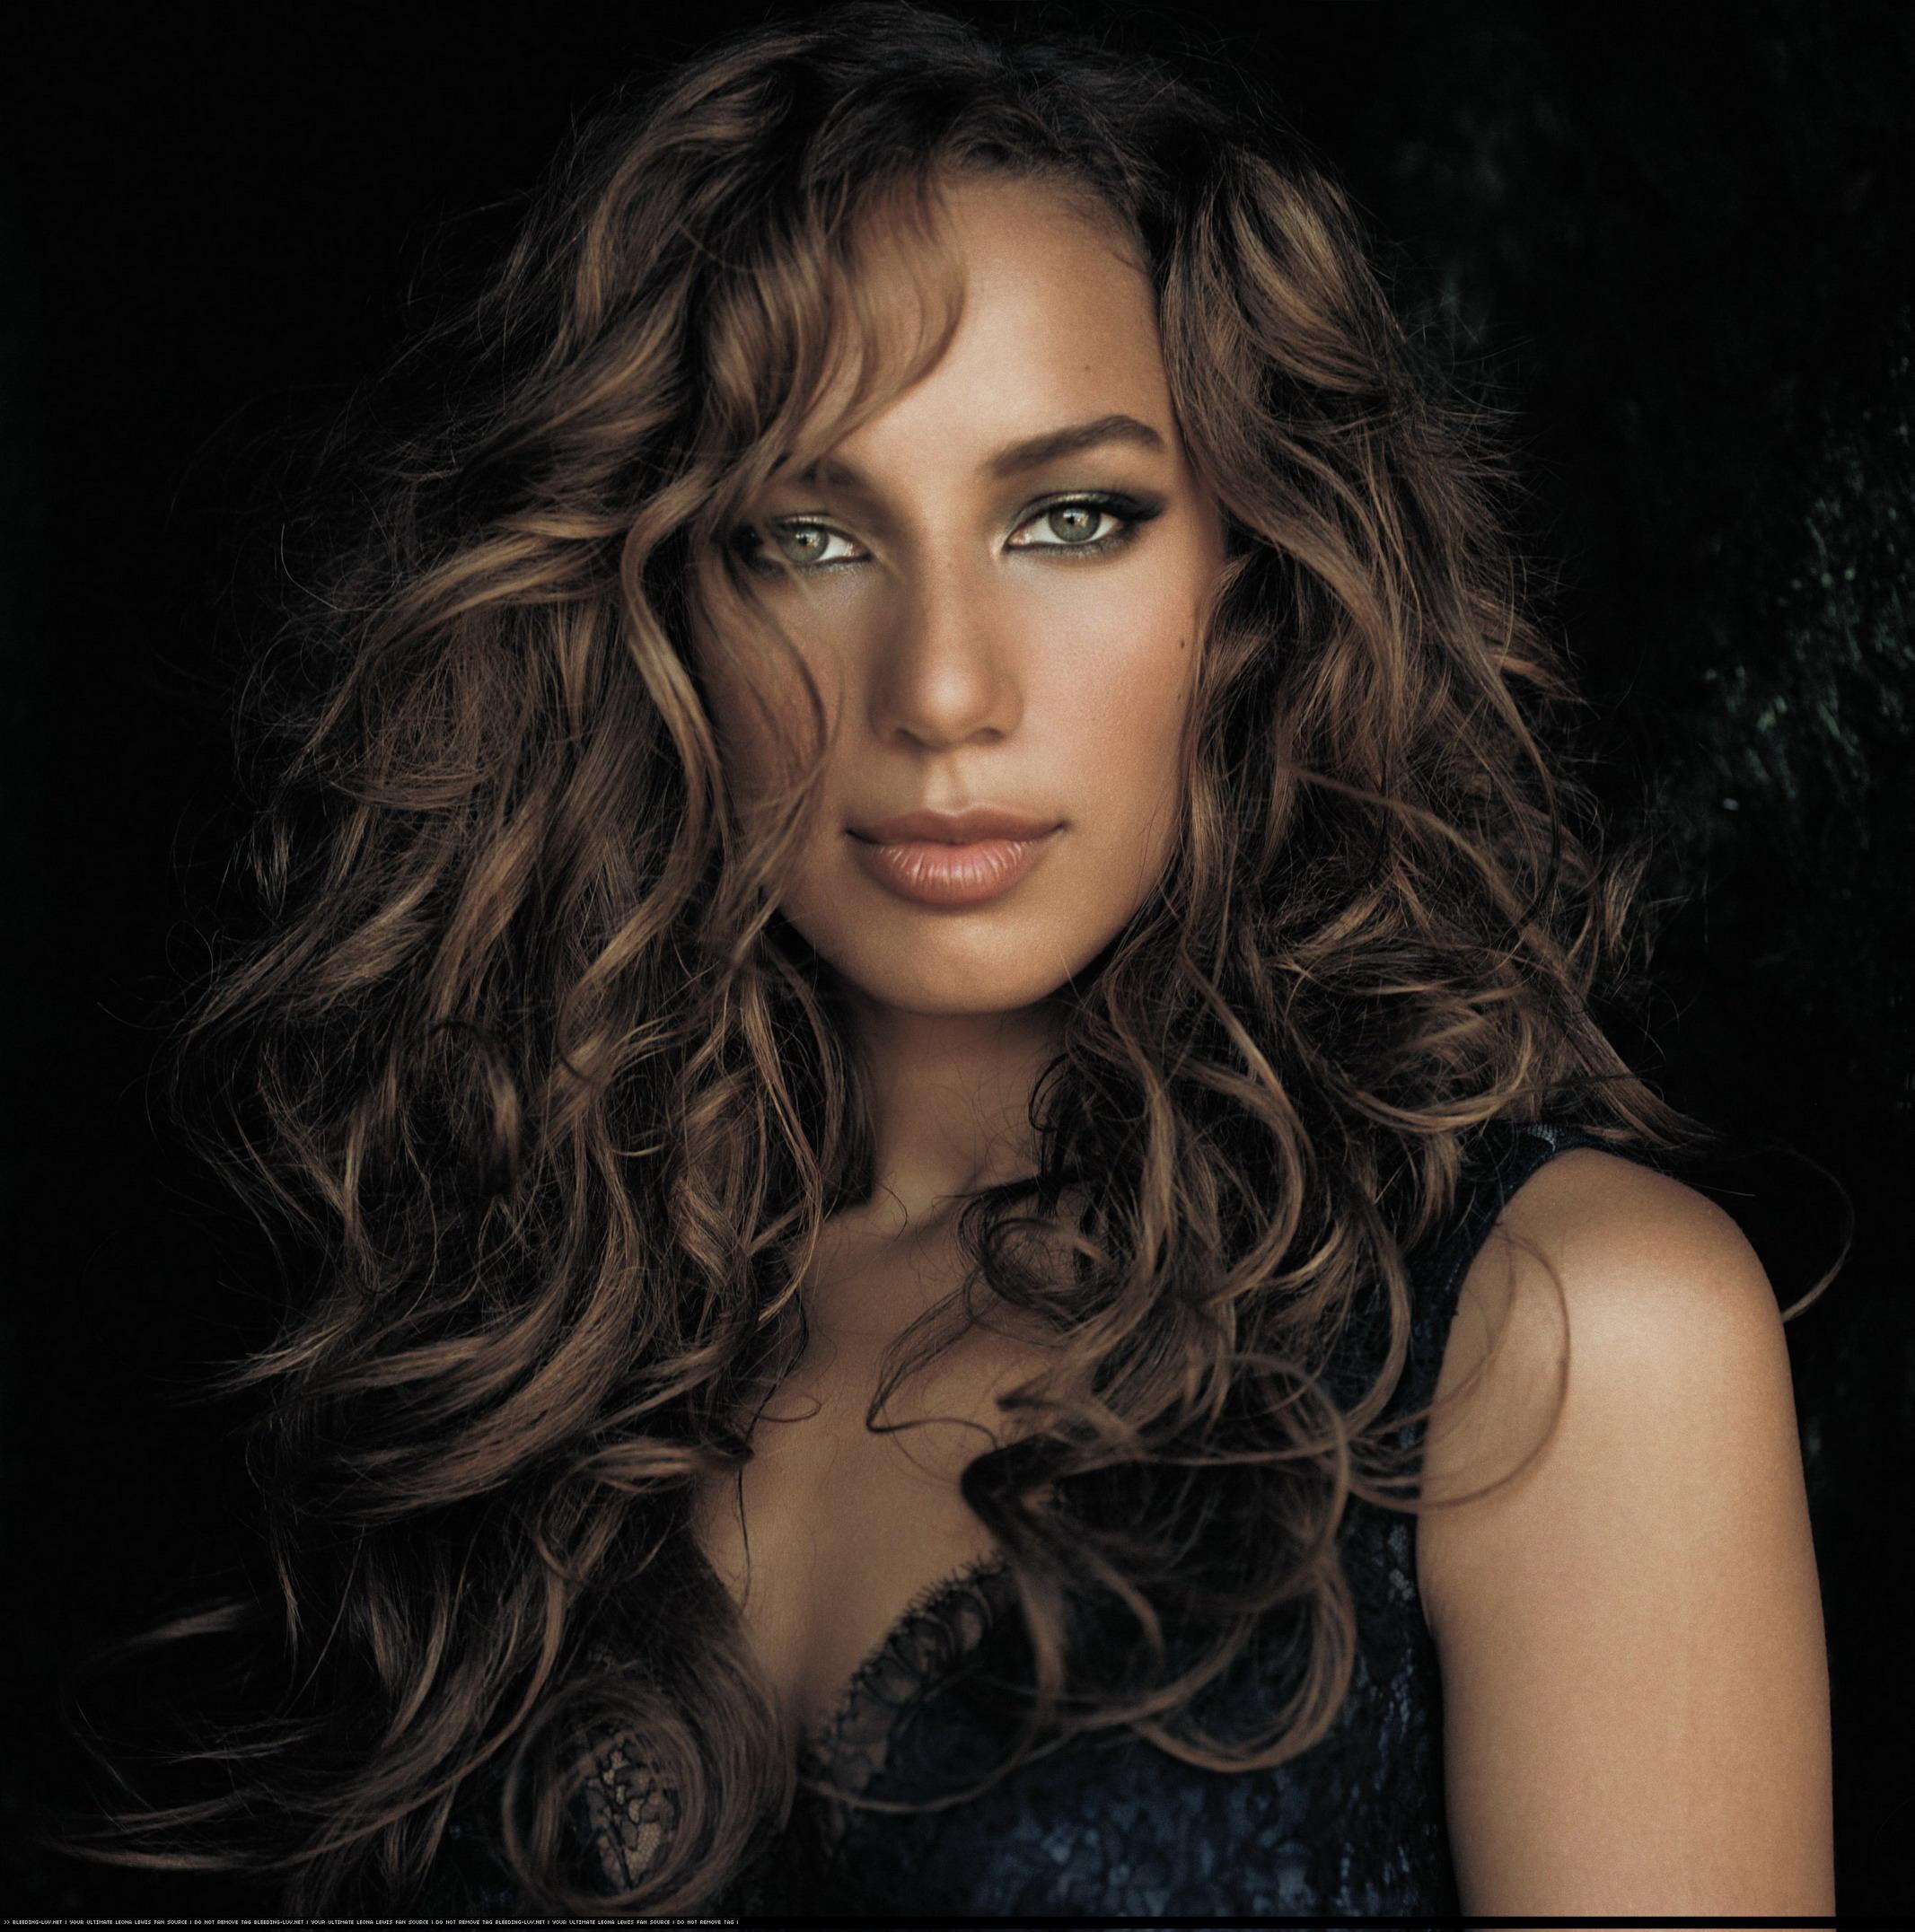 Avatar - Leona Lewis - I See You Music Video And Lyrics.